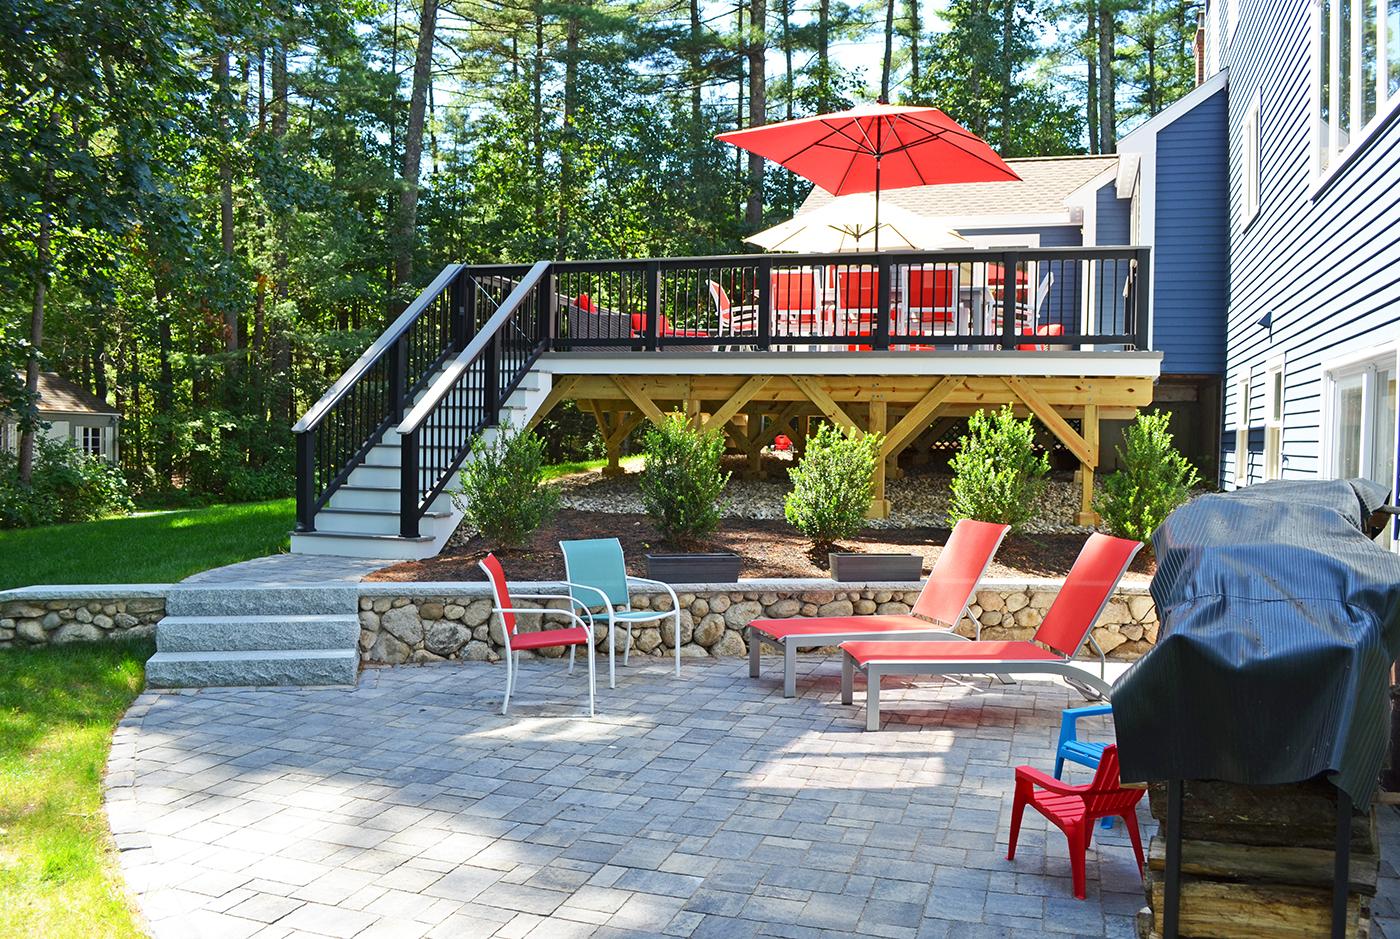 oakville on deck builder creates stunning dream backyards with